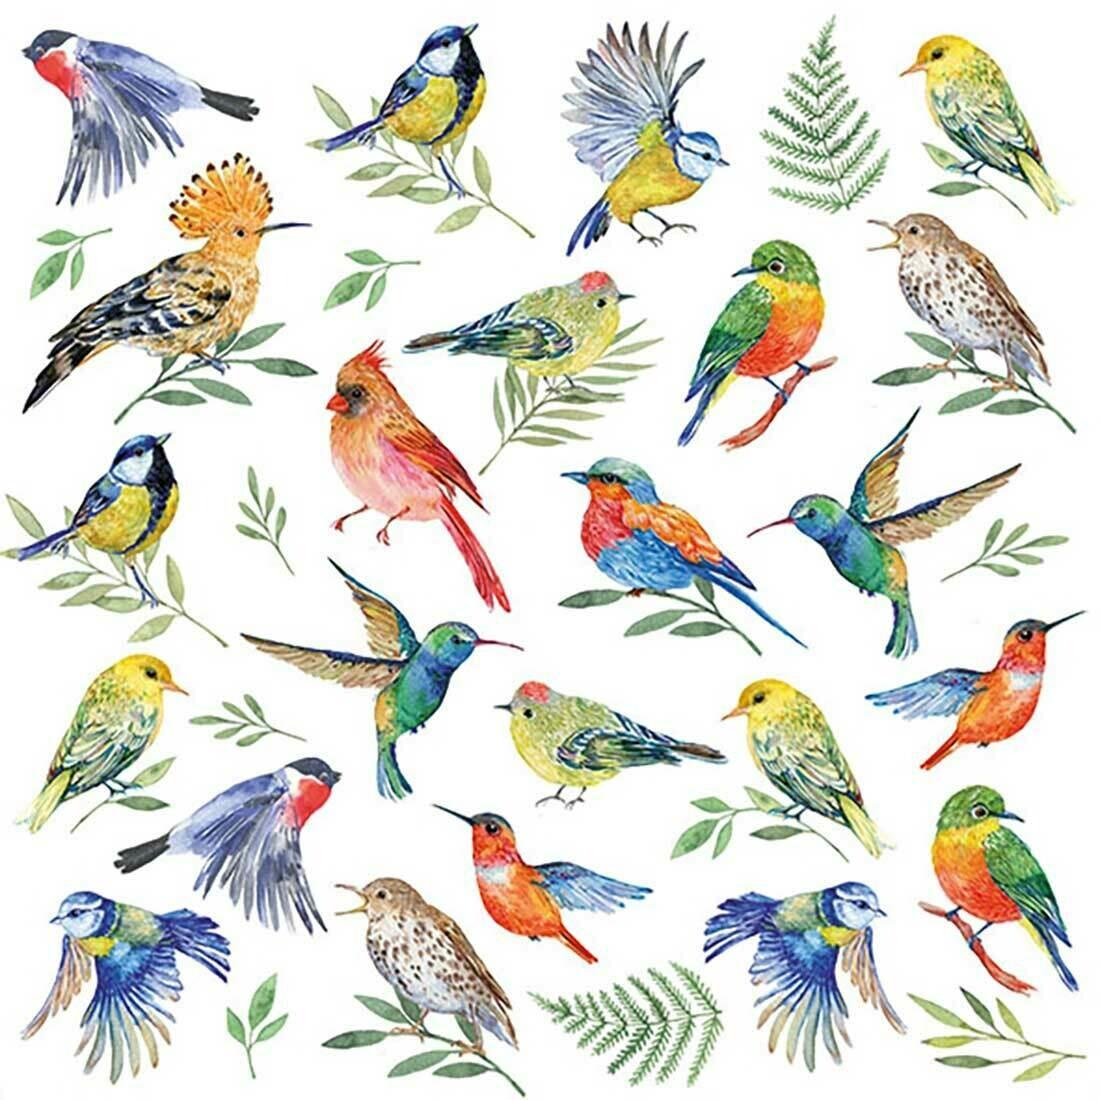 Decoupage Paper Napkins - Birds Vote (1 Sheet)